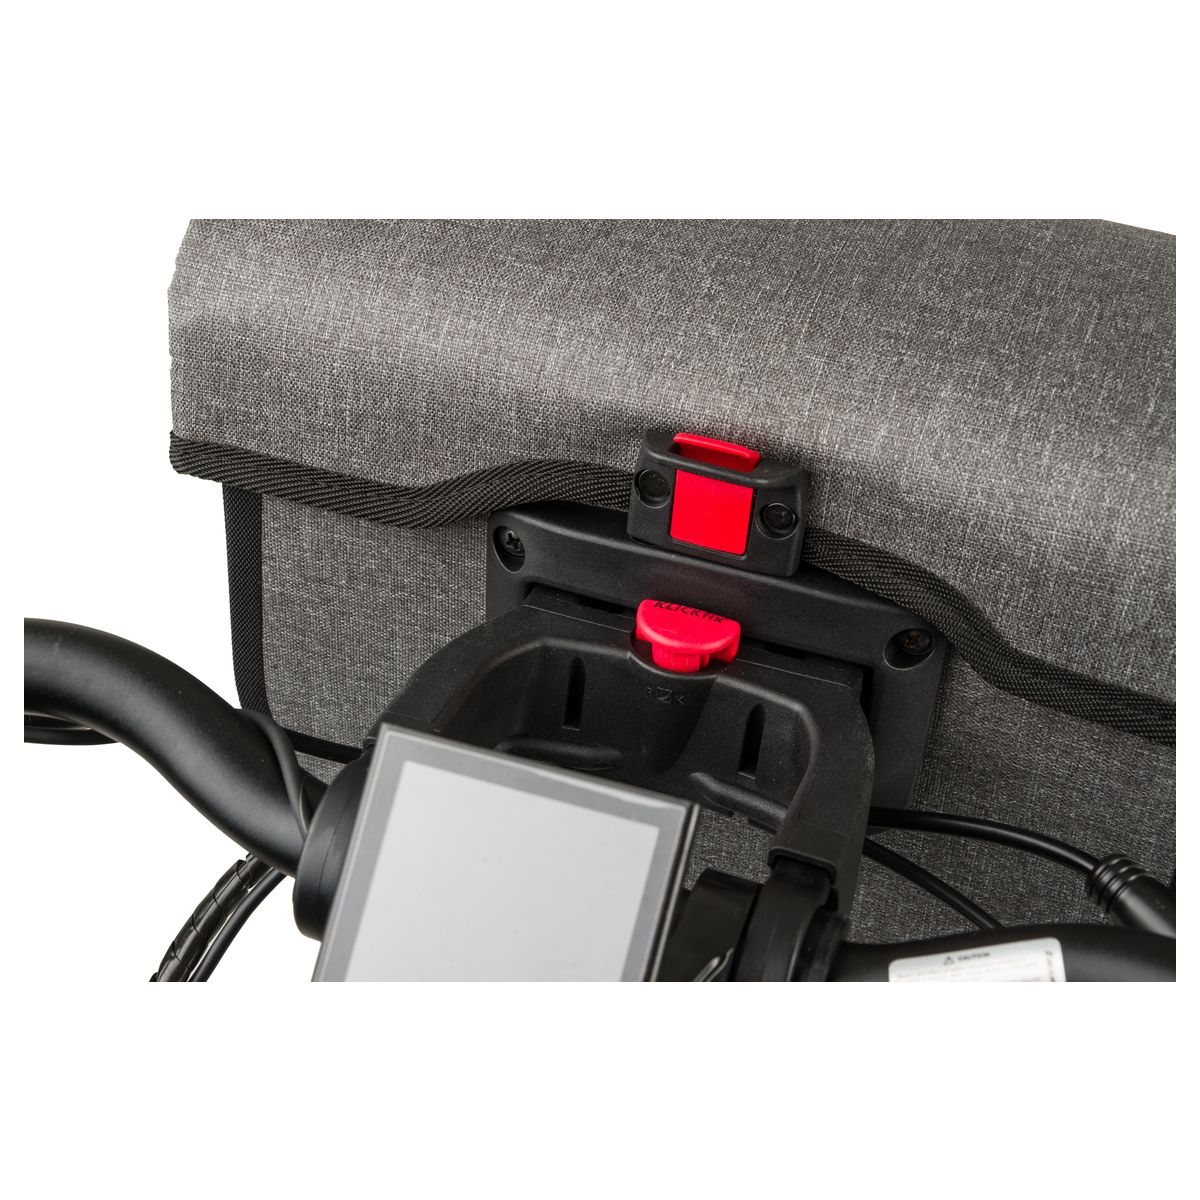 Tech Handlebar Bag Shelter Large fit example